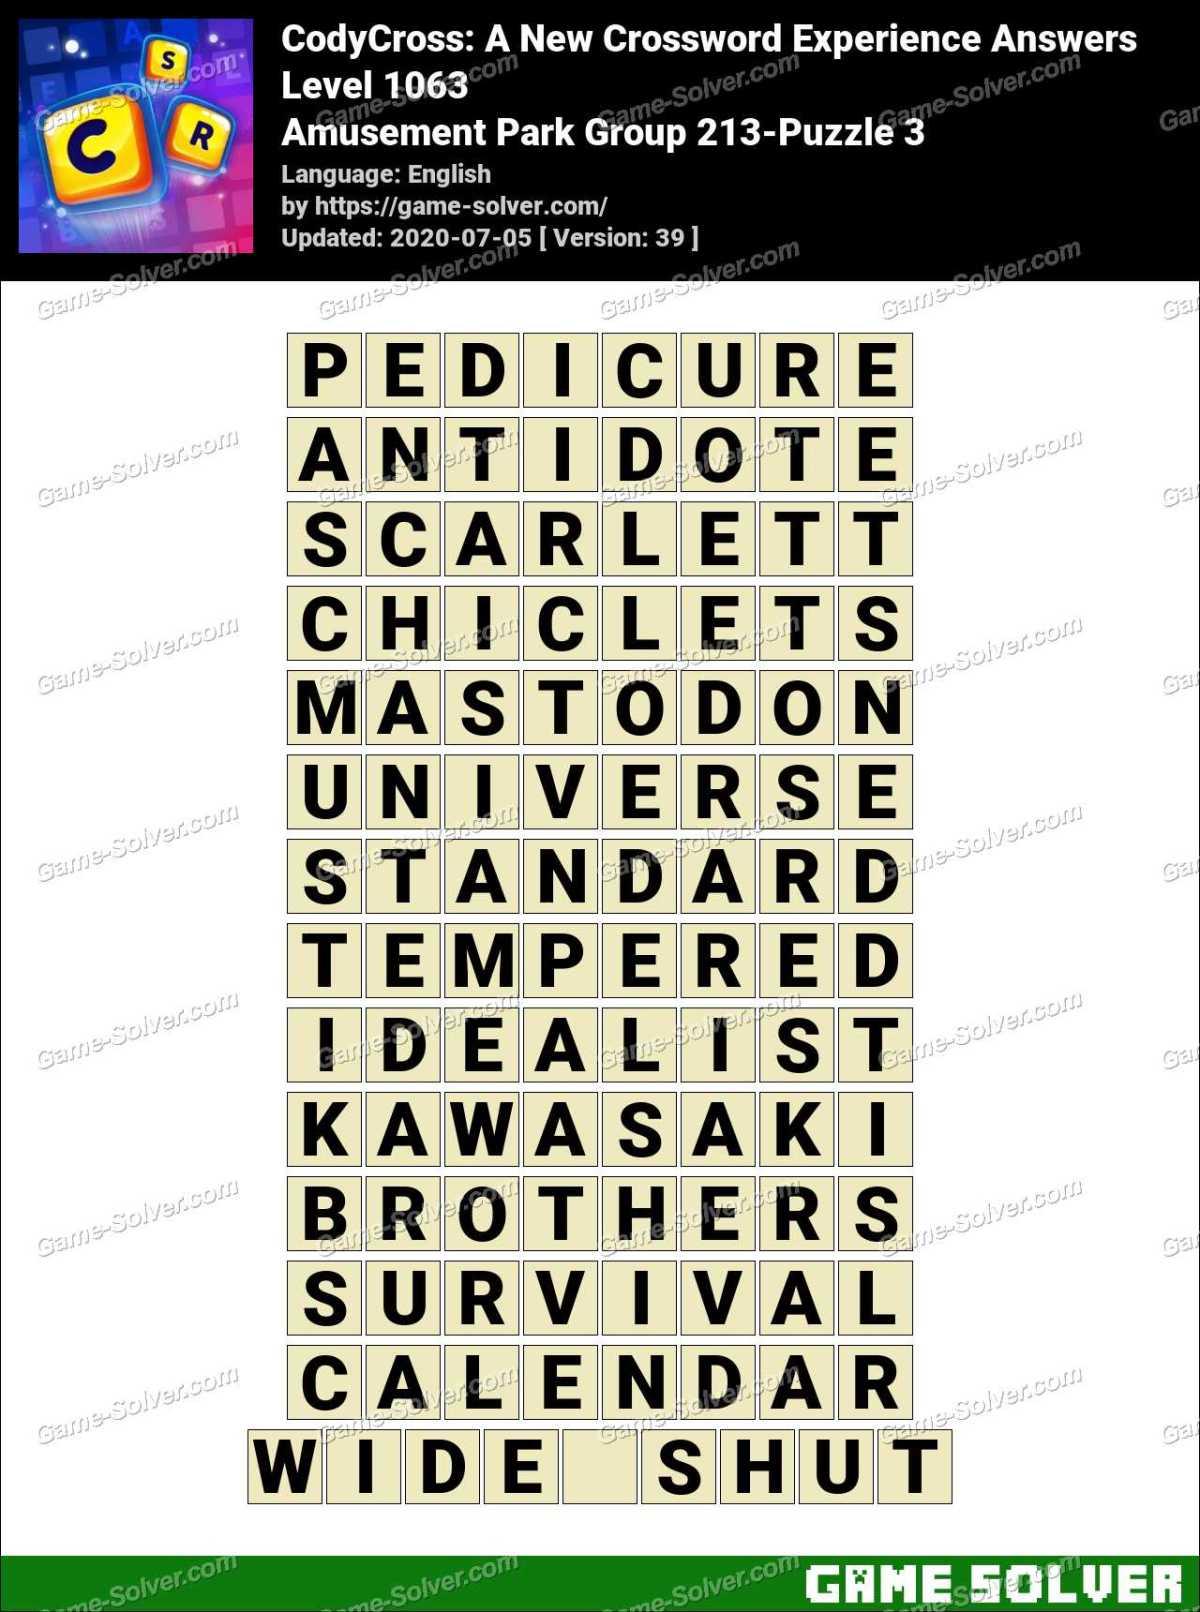 CodyCross Amusement Park Group 213-Puzzle 3 Answers